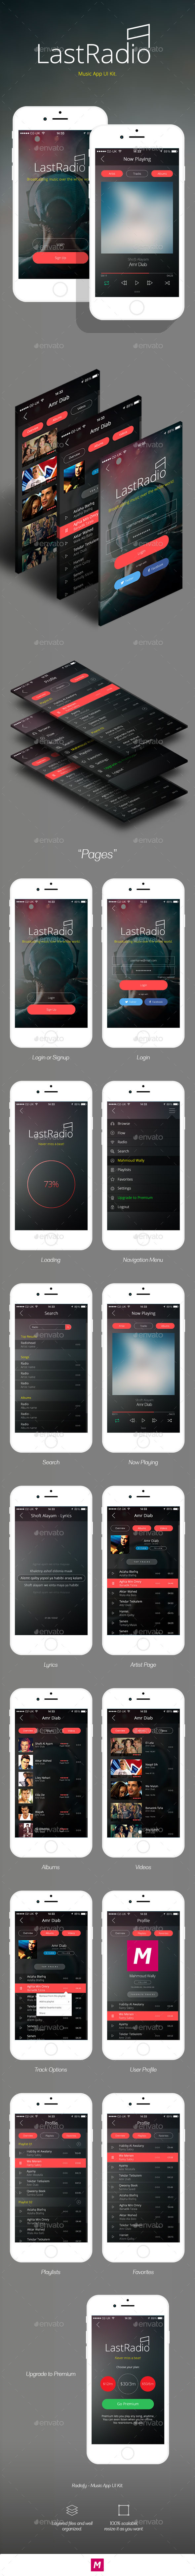 GraphicRiver LastRadio Music App UI Kit 11798166